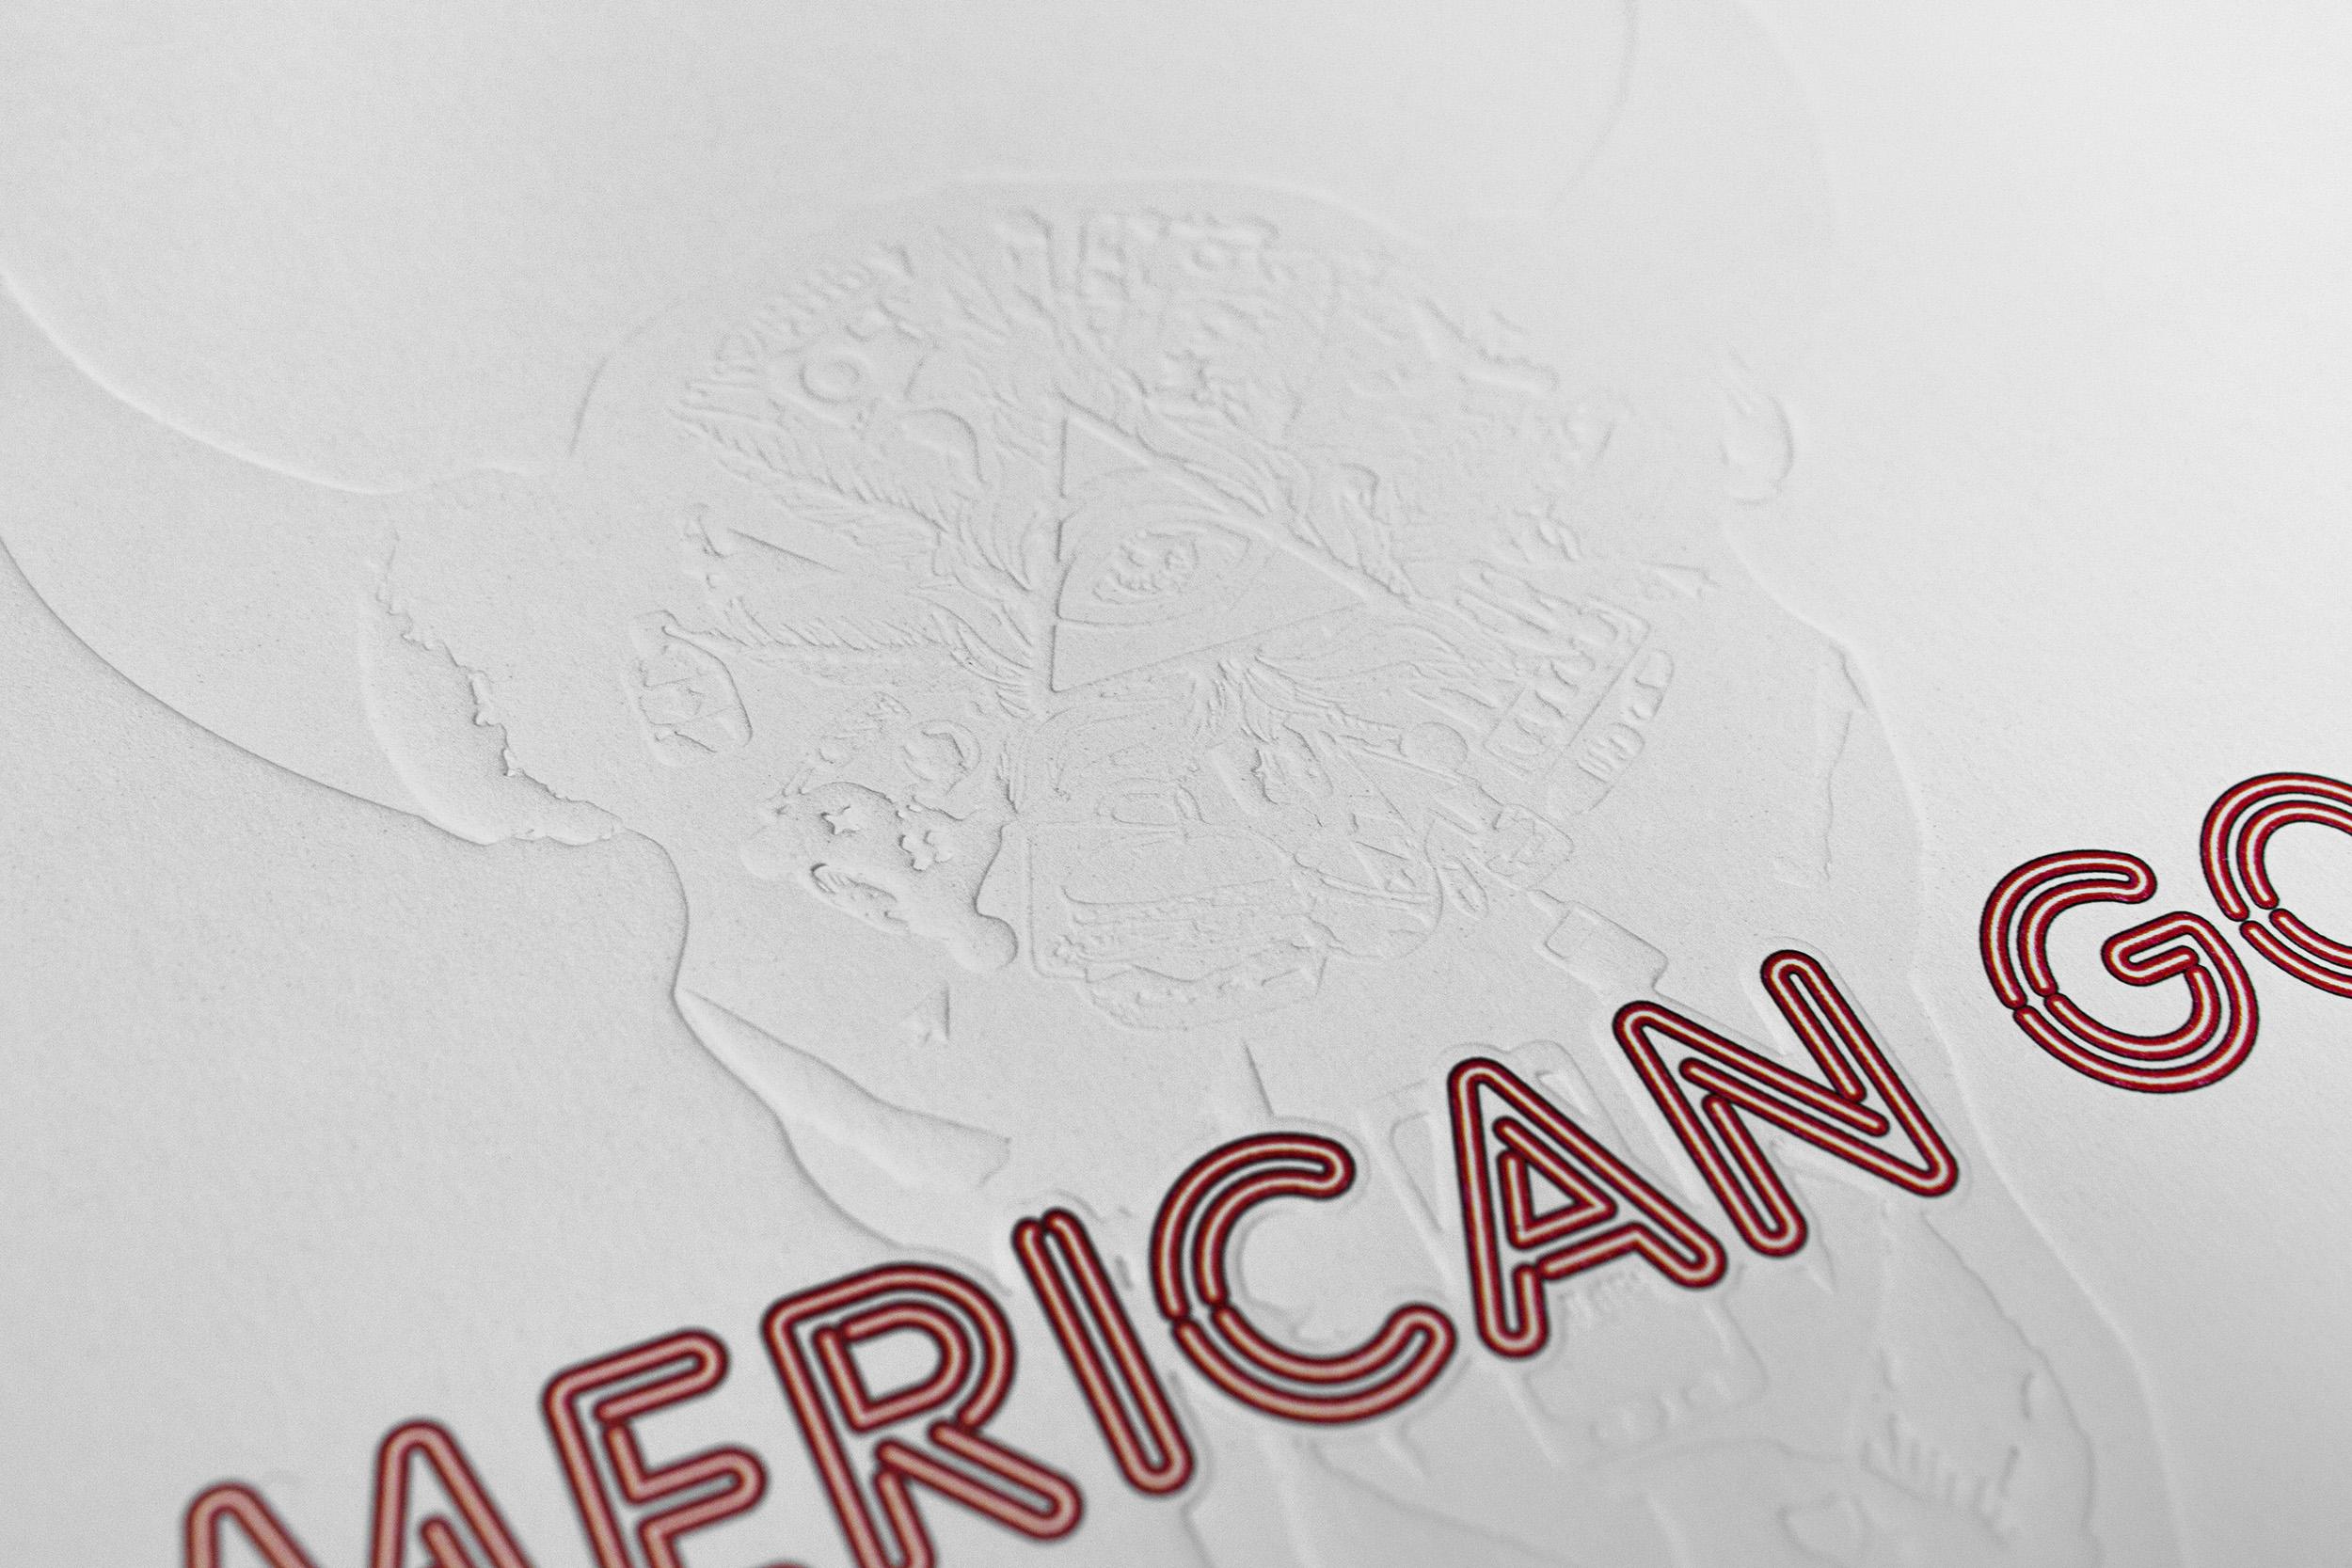 American Gods blind embossed brochure cover